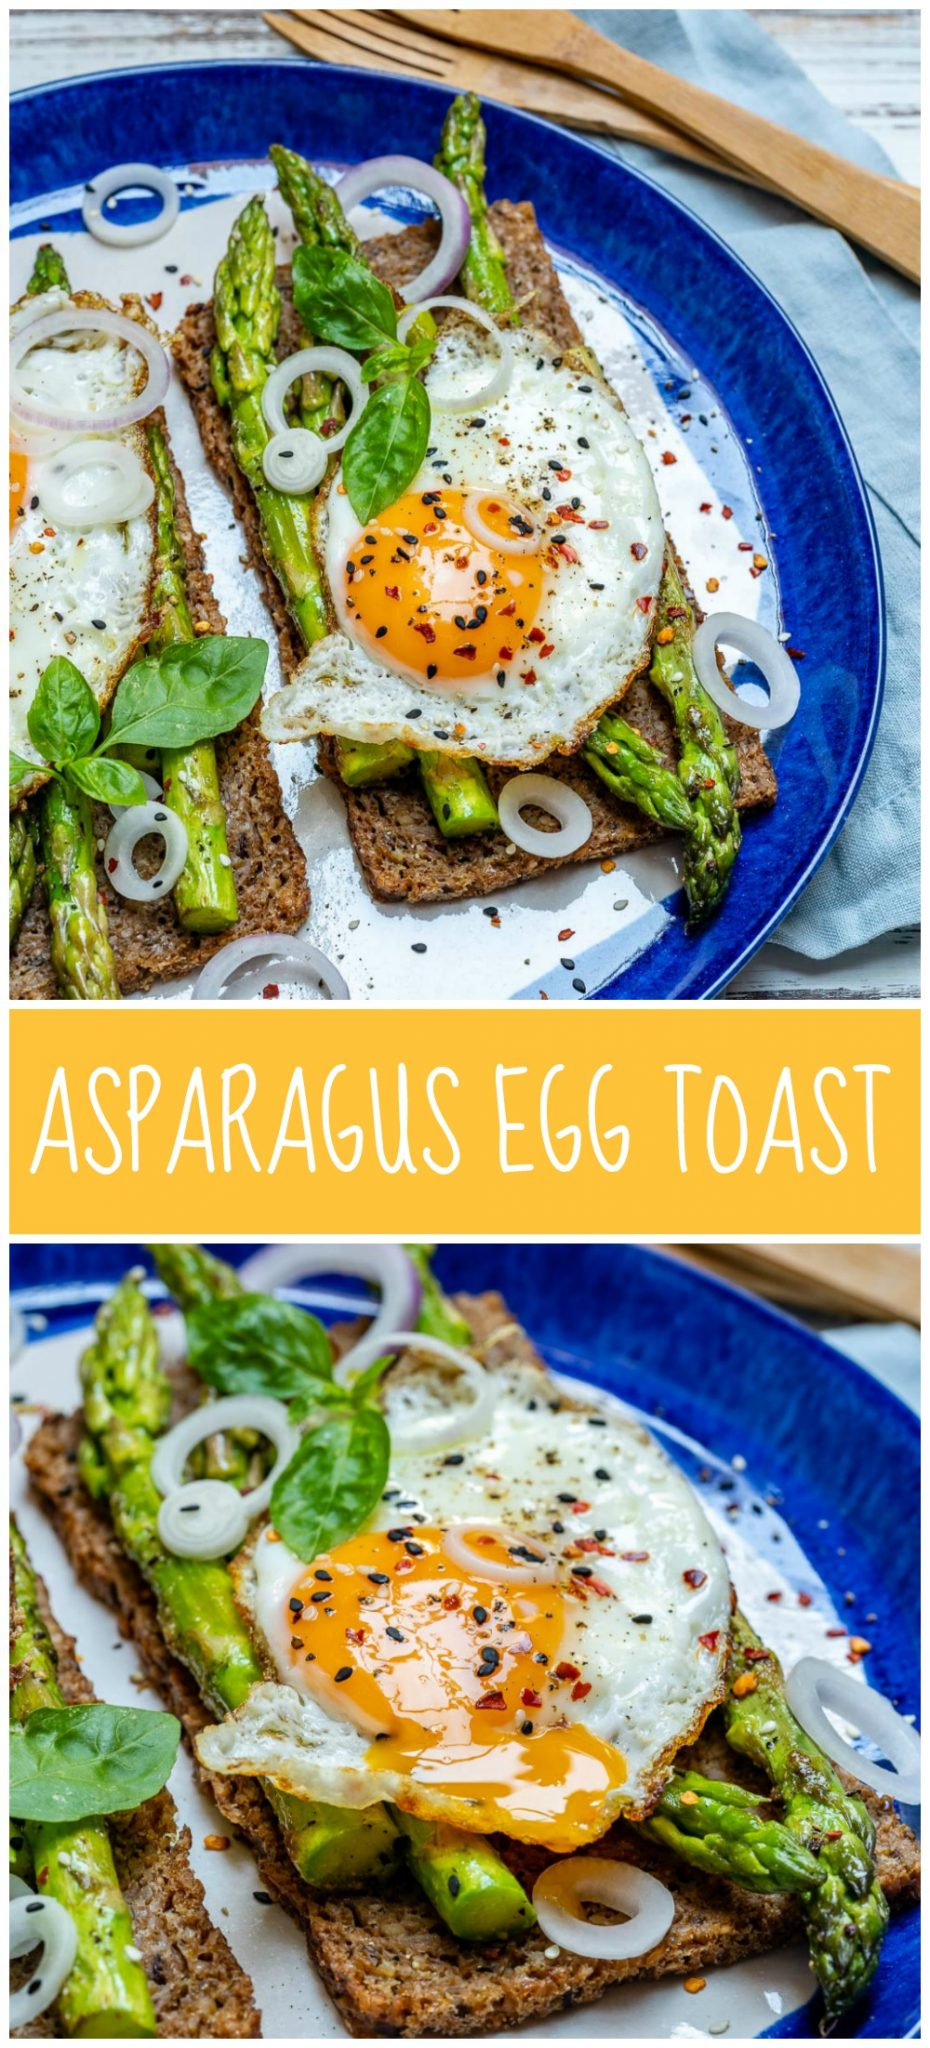 Breakfast Recipes Asparagus Egg Toast